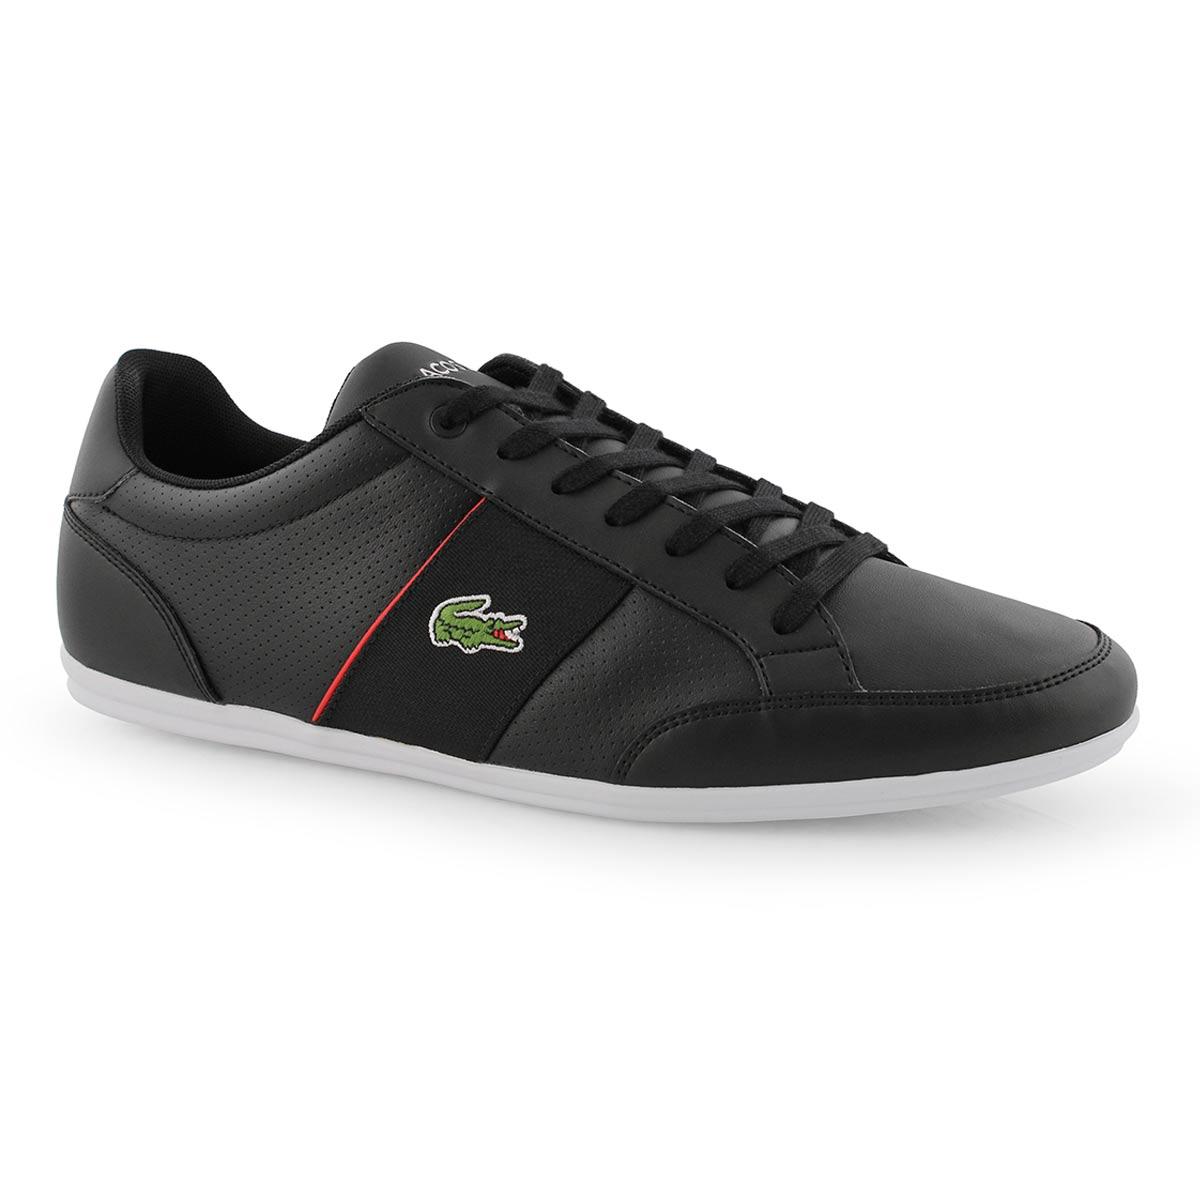 Men's Nivolor 119 1 P Sneaker - Black/Red